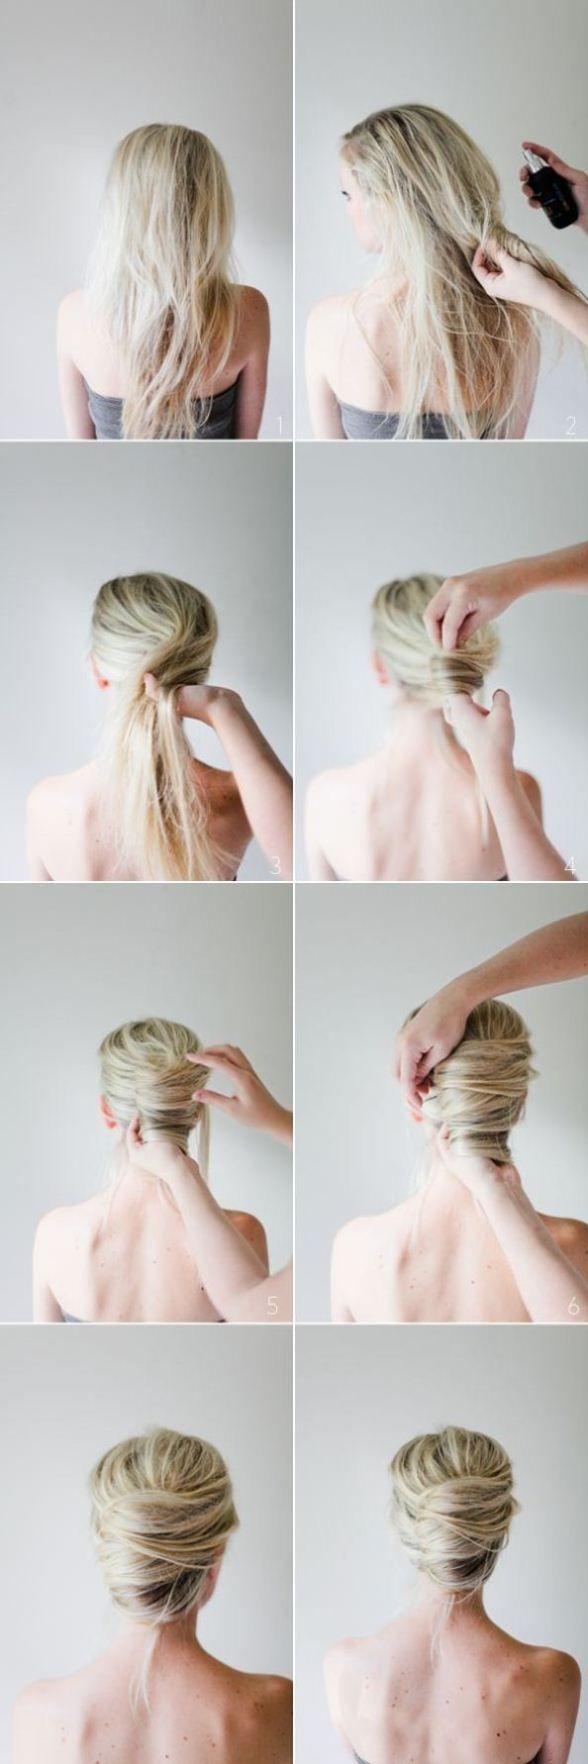 DIY Hair Bun… they make it look so easy!